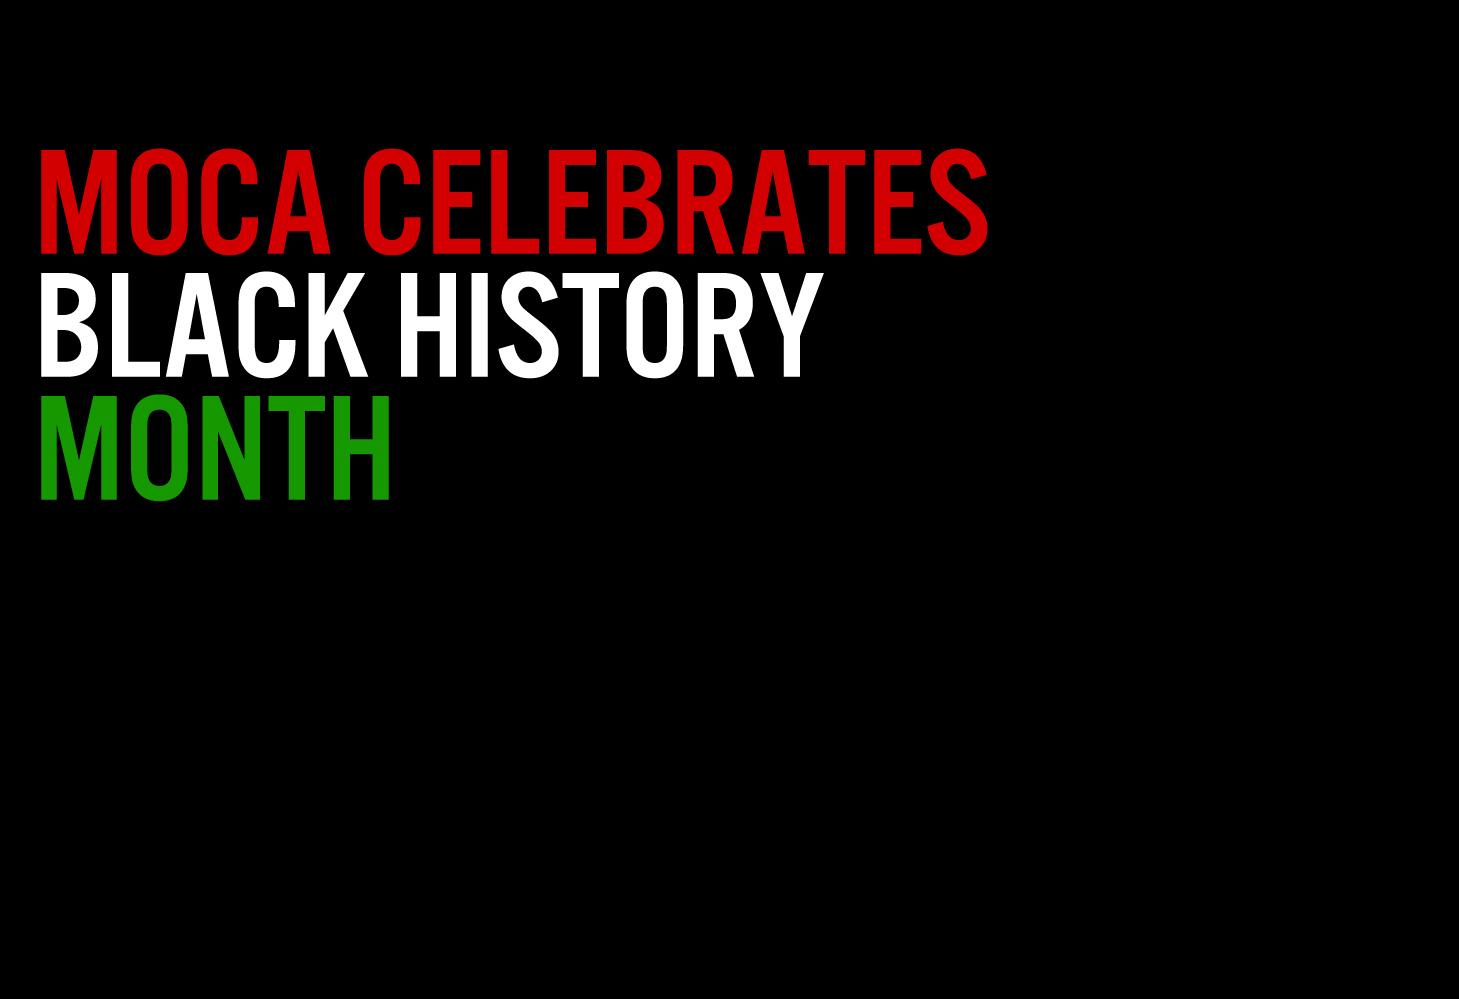 MOCA Celebrates Black History Month